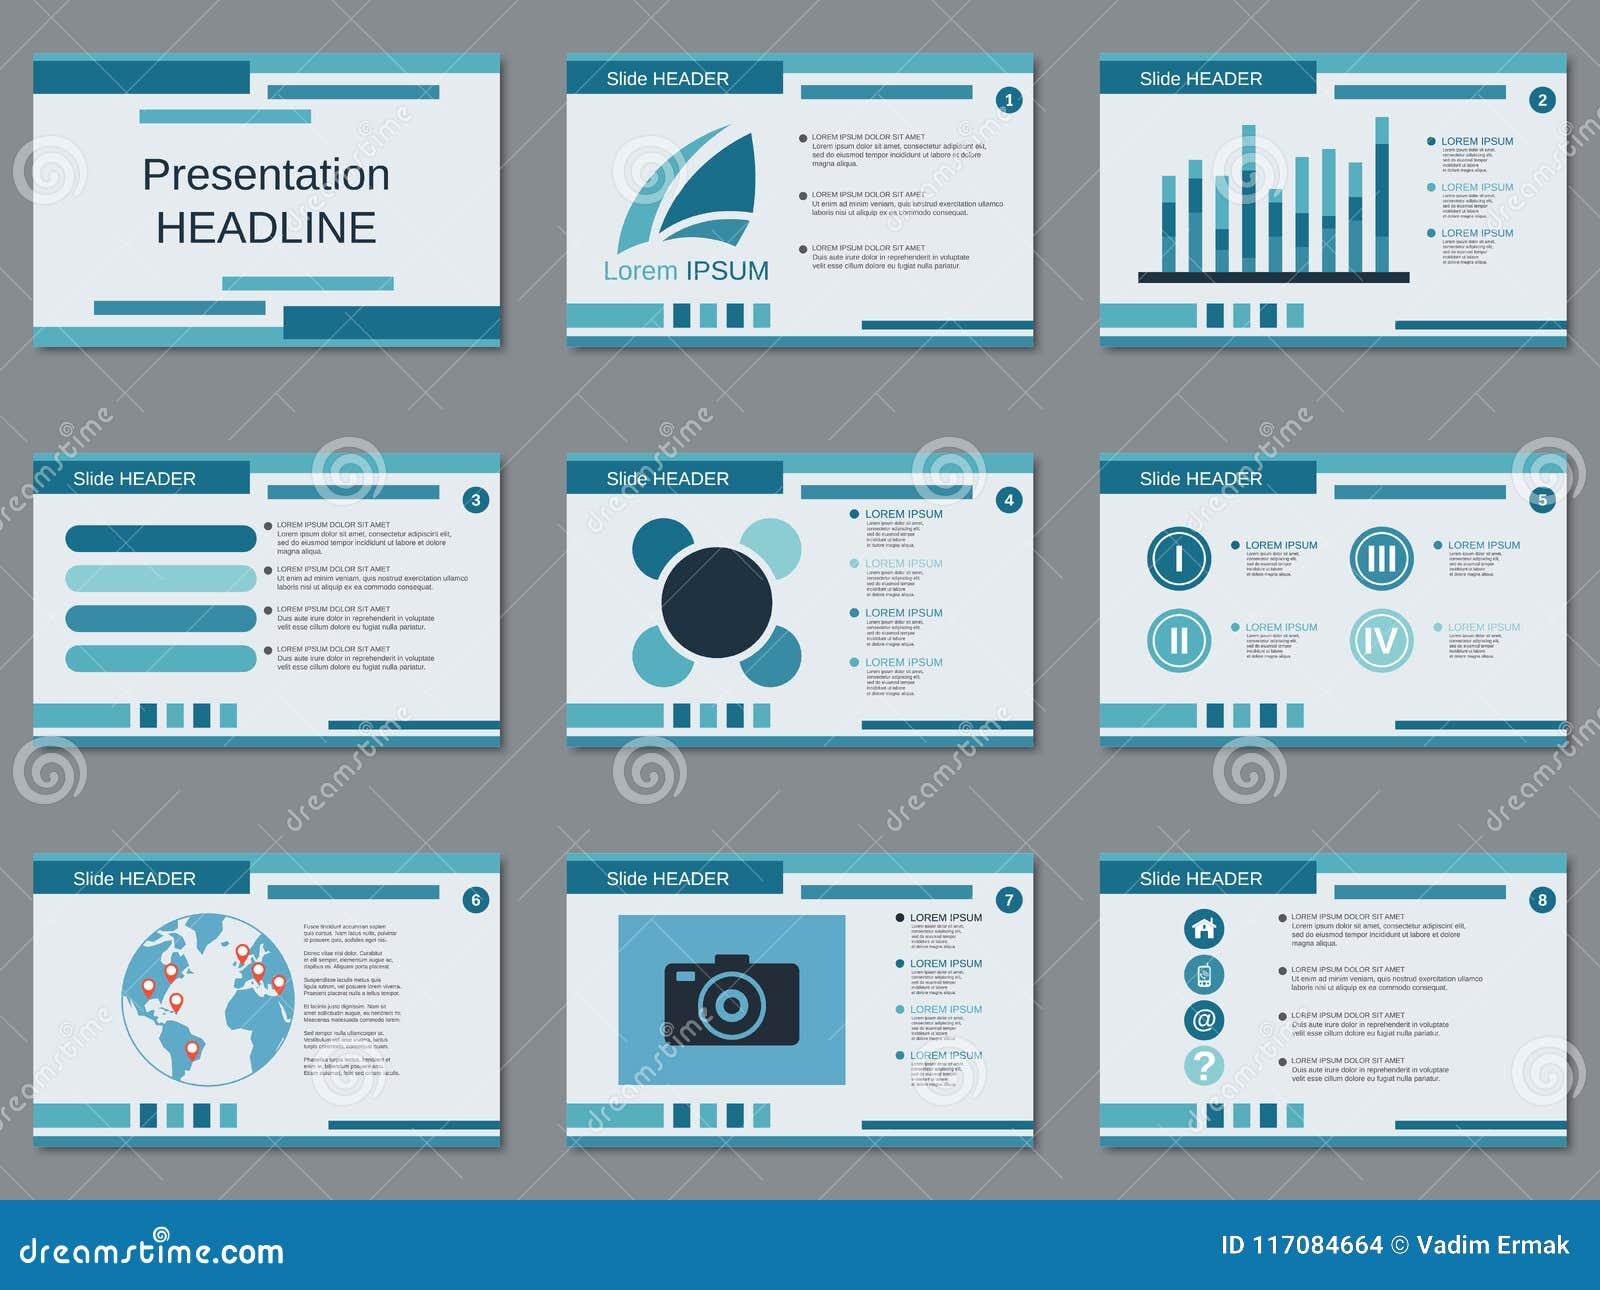 Professional business presentation slide show vector template stock professional business presentation slide show vector design template accmission Choice Image